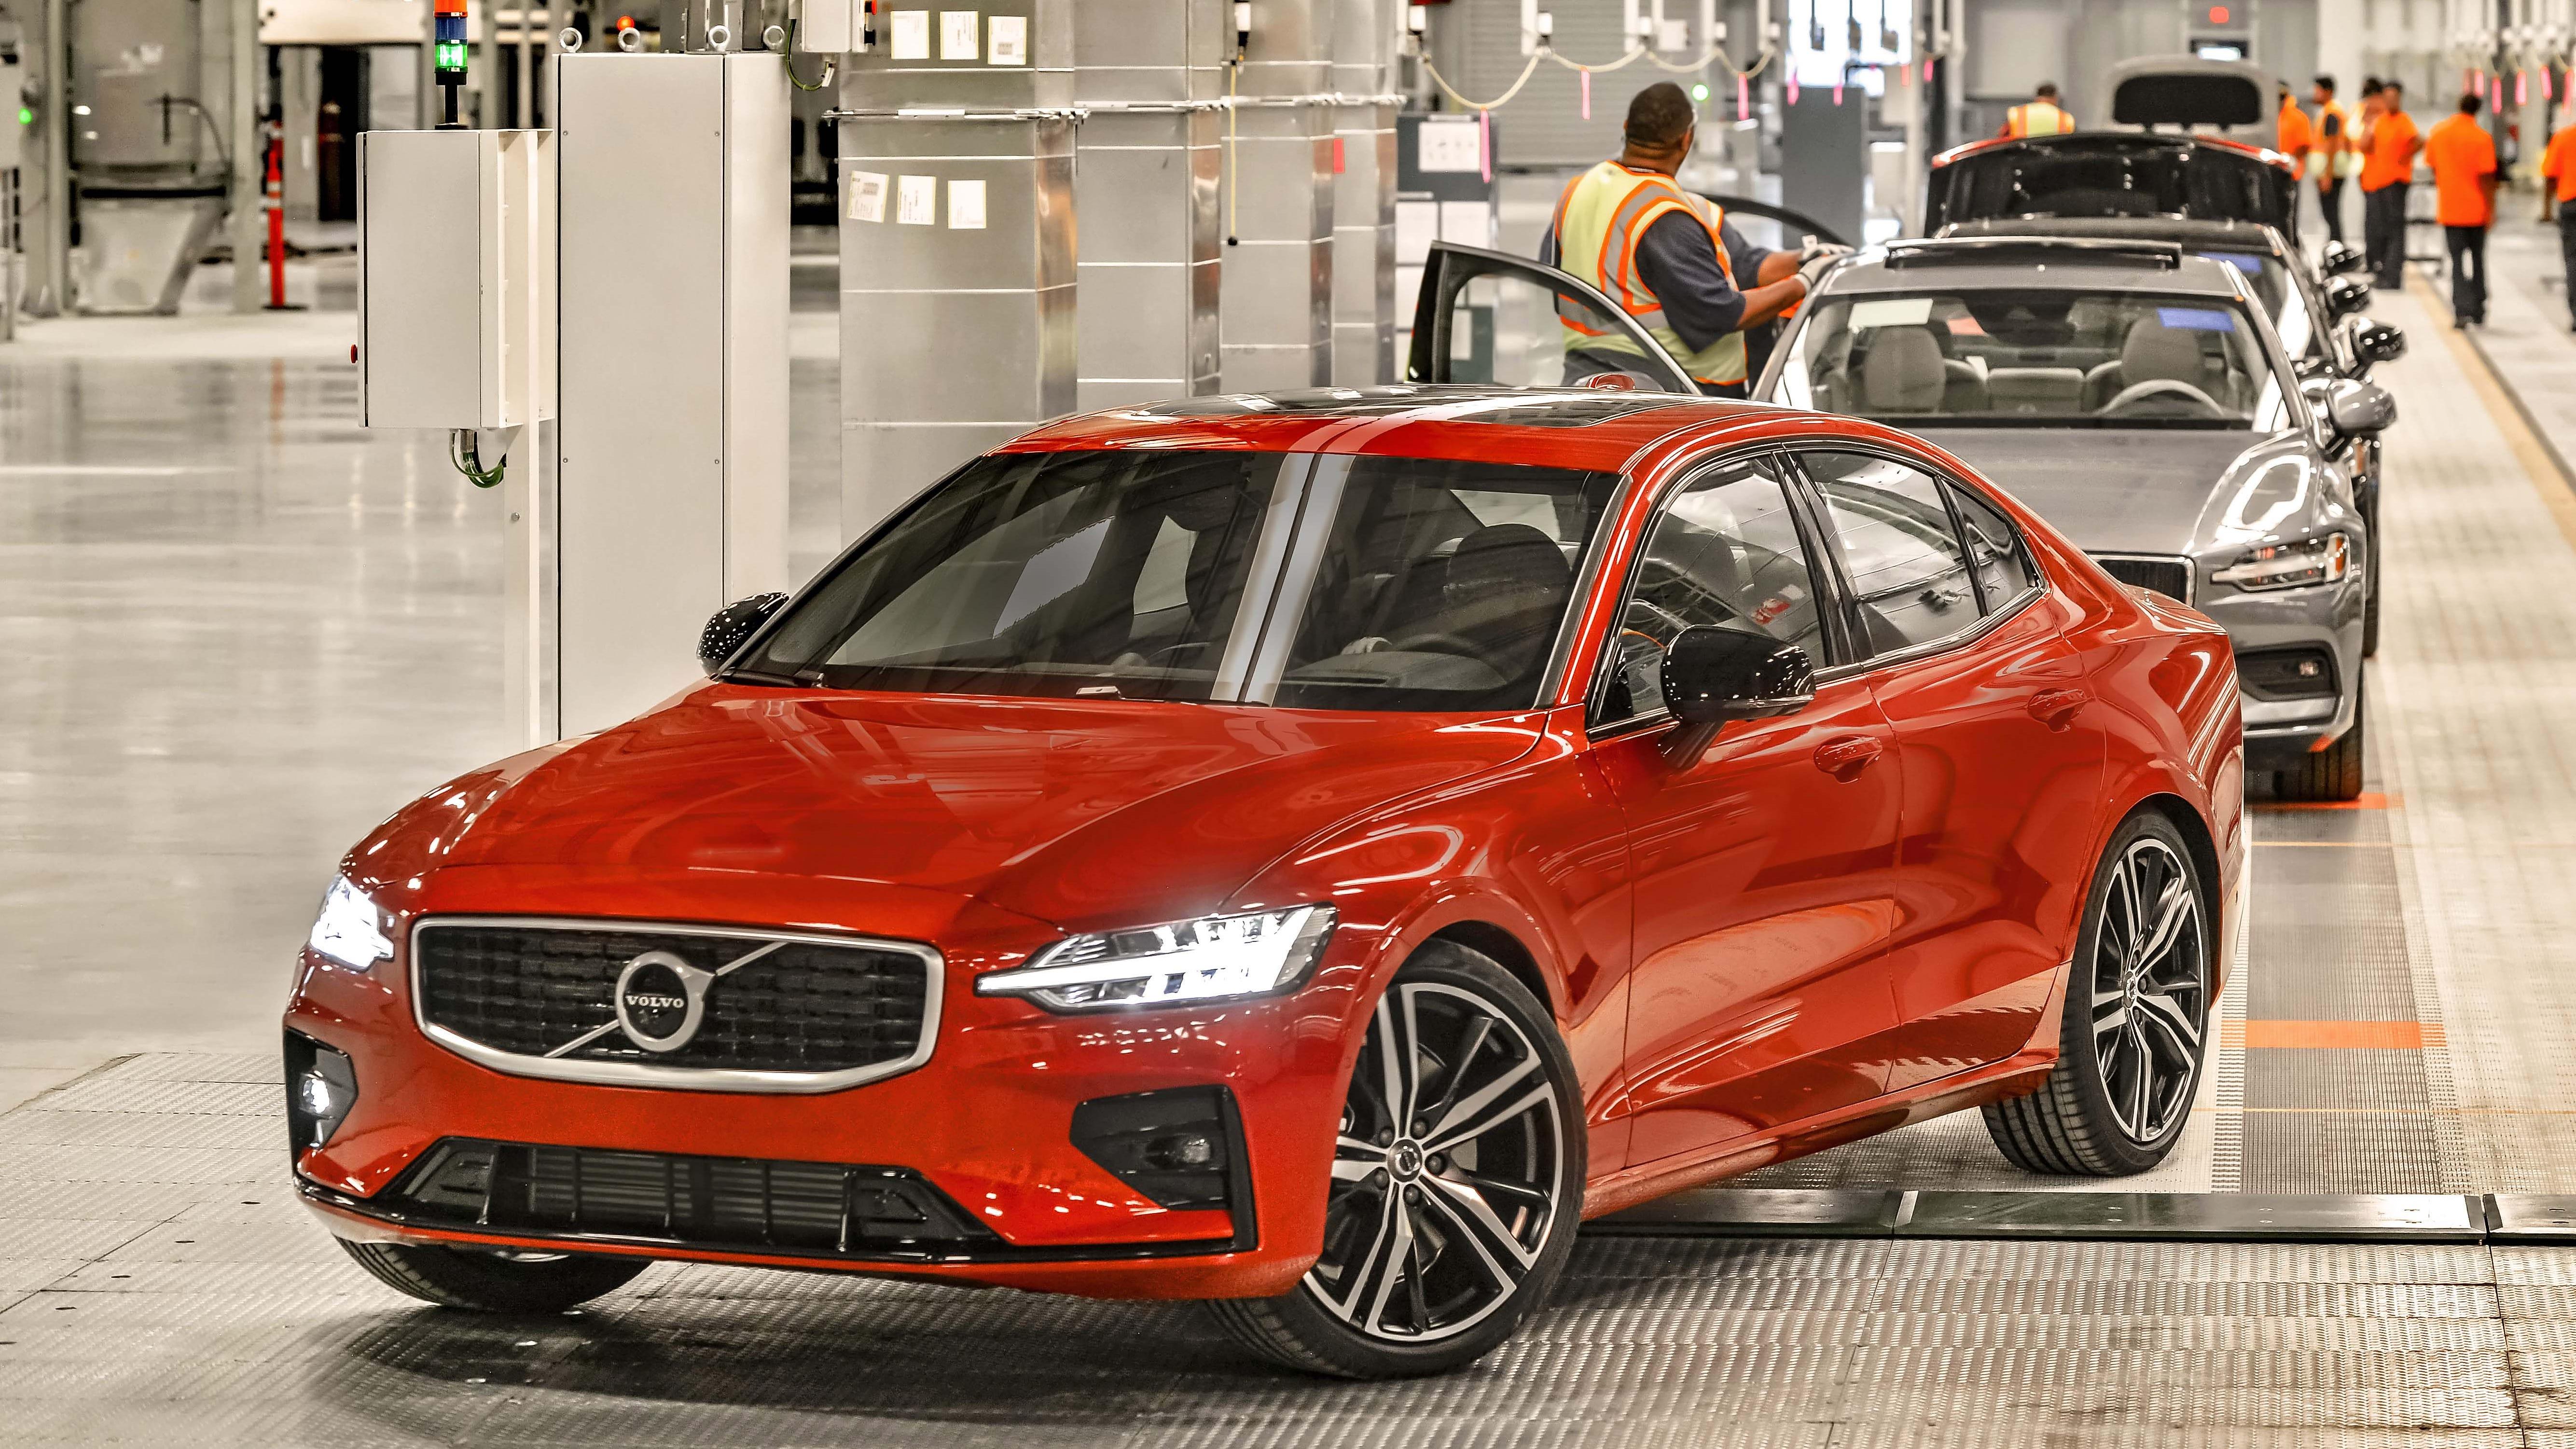 From Honda to Volvo: New U.S. auto transplant transcends tariffs